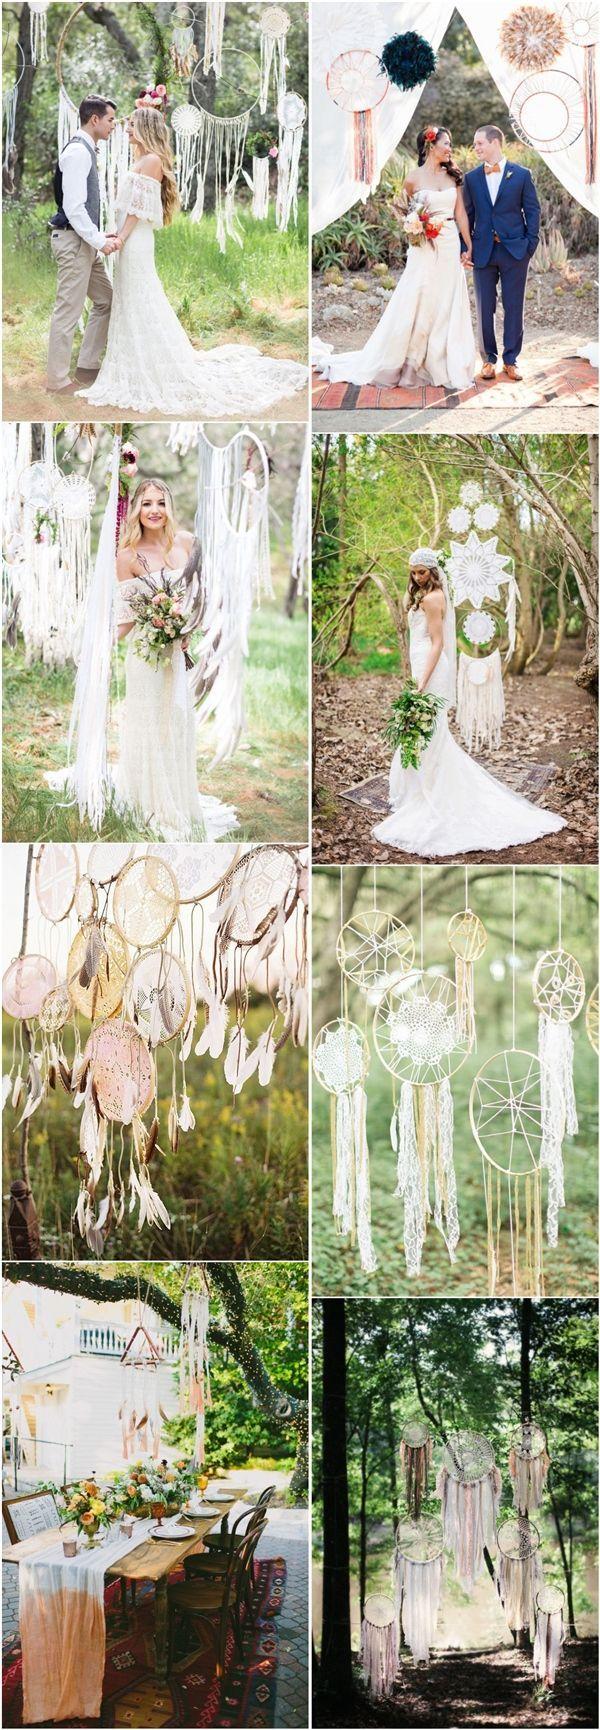 453 Best Bohemian Weddings Images On Pinterest Altar Altars And